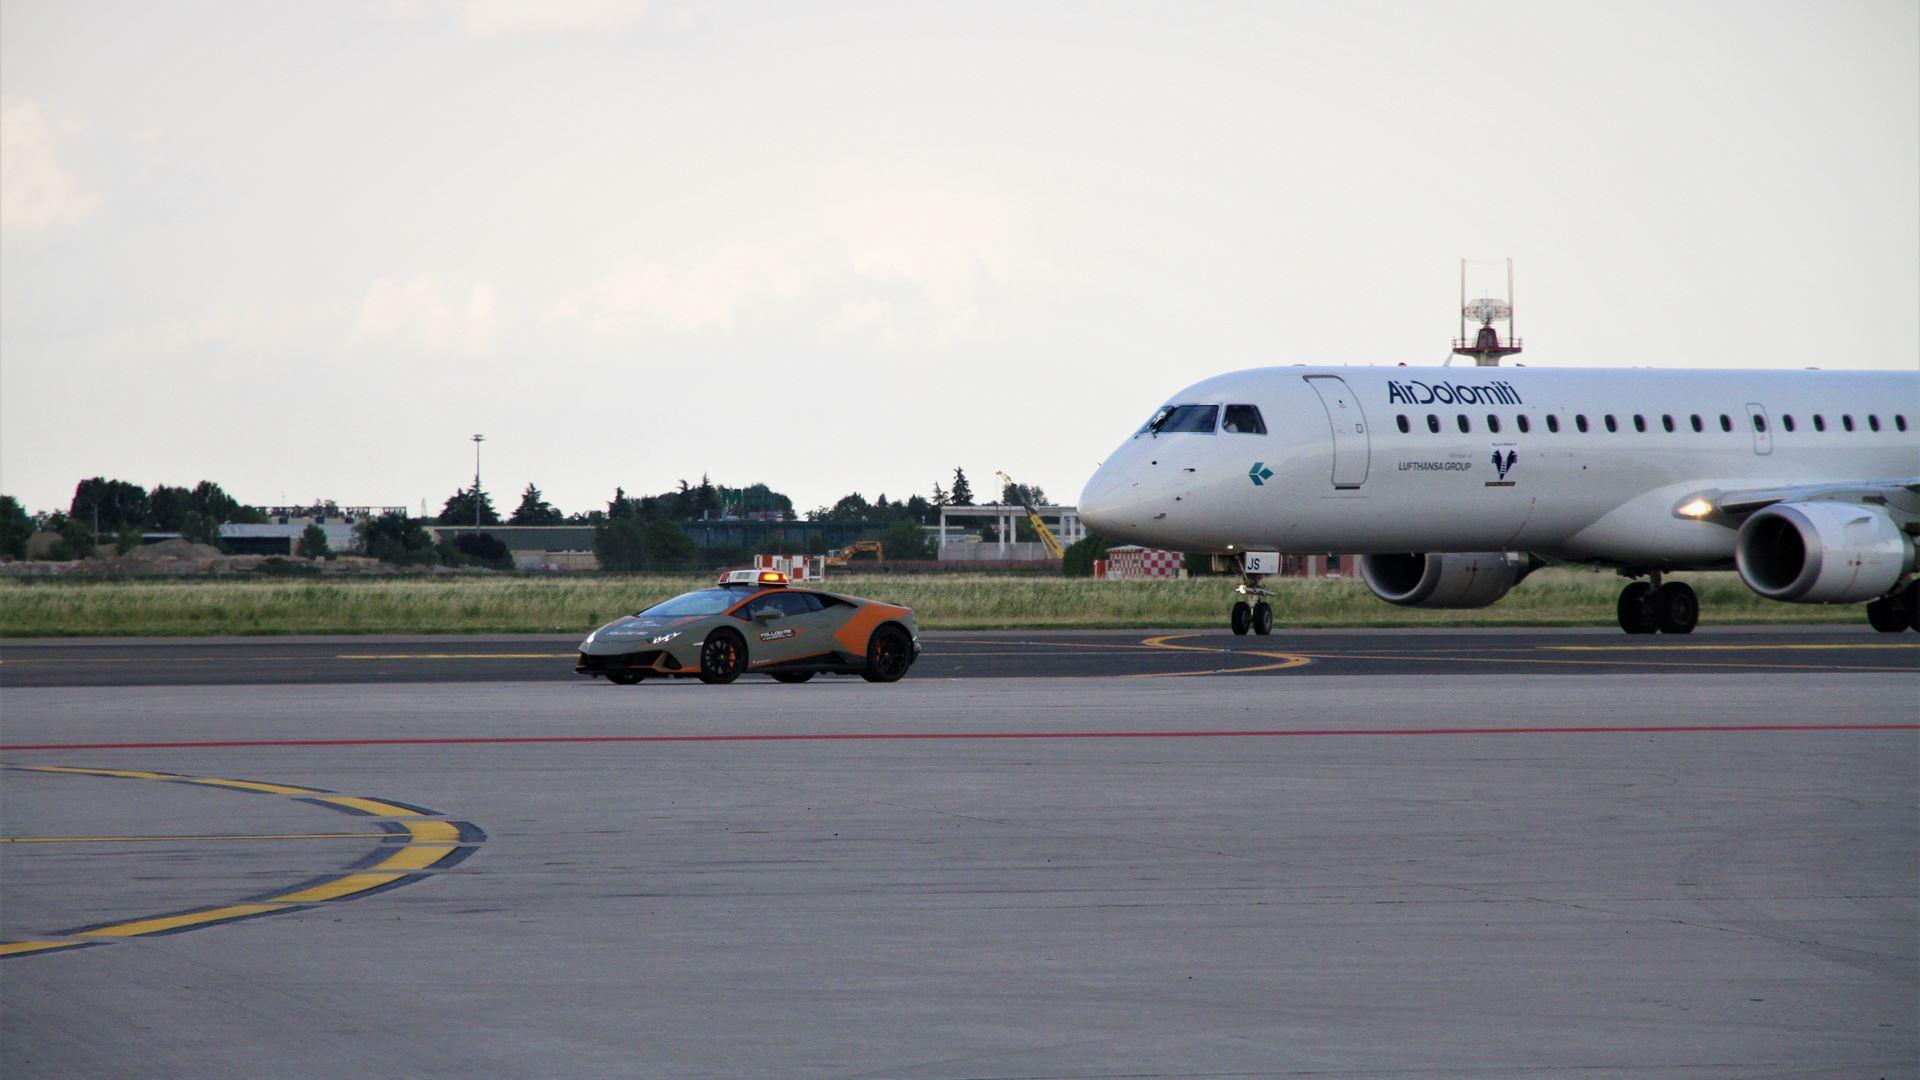 A new Lamborghini Huracán EVO follow-me car for Bologna Airport - Image 1